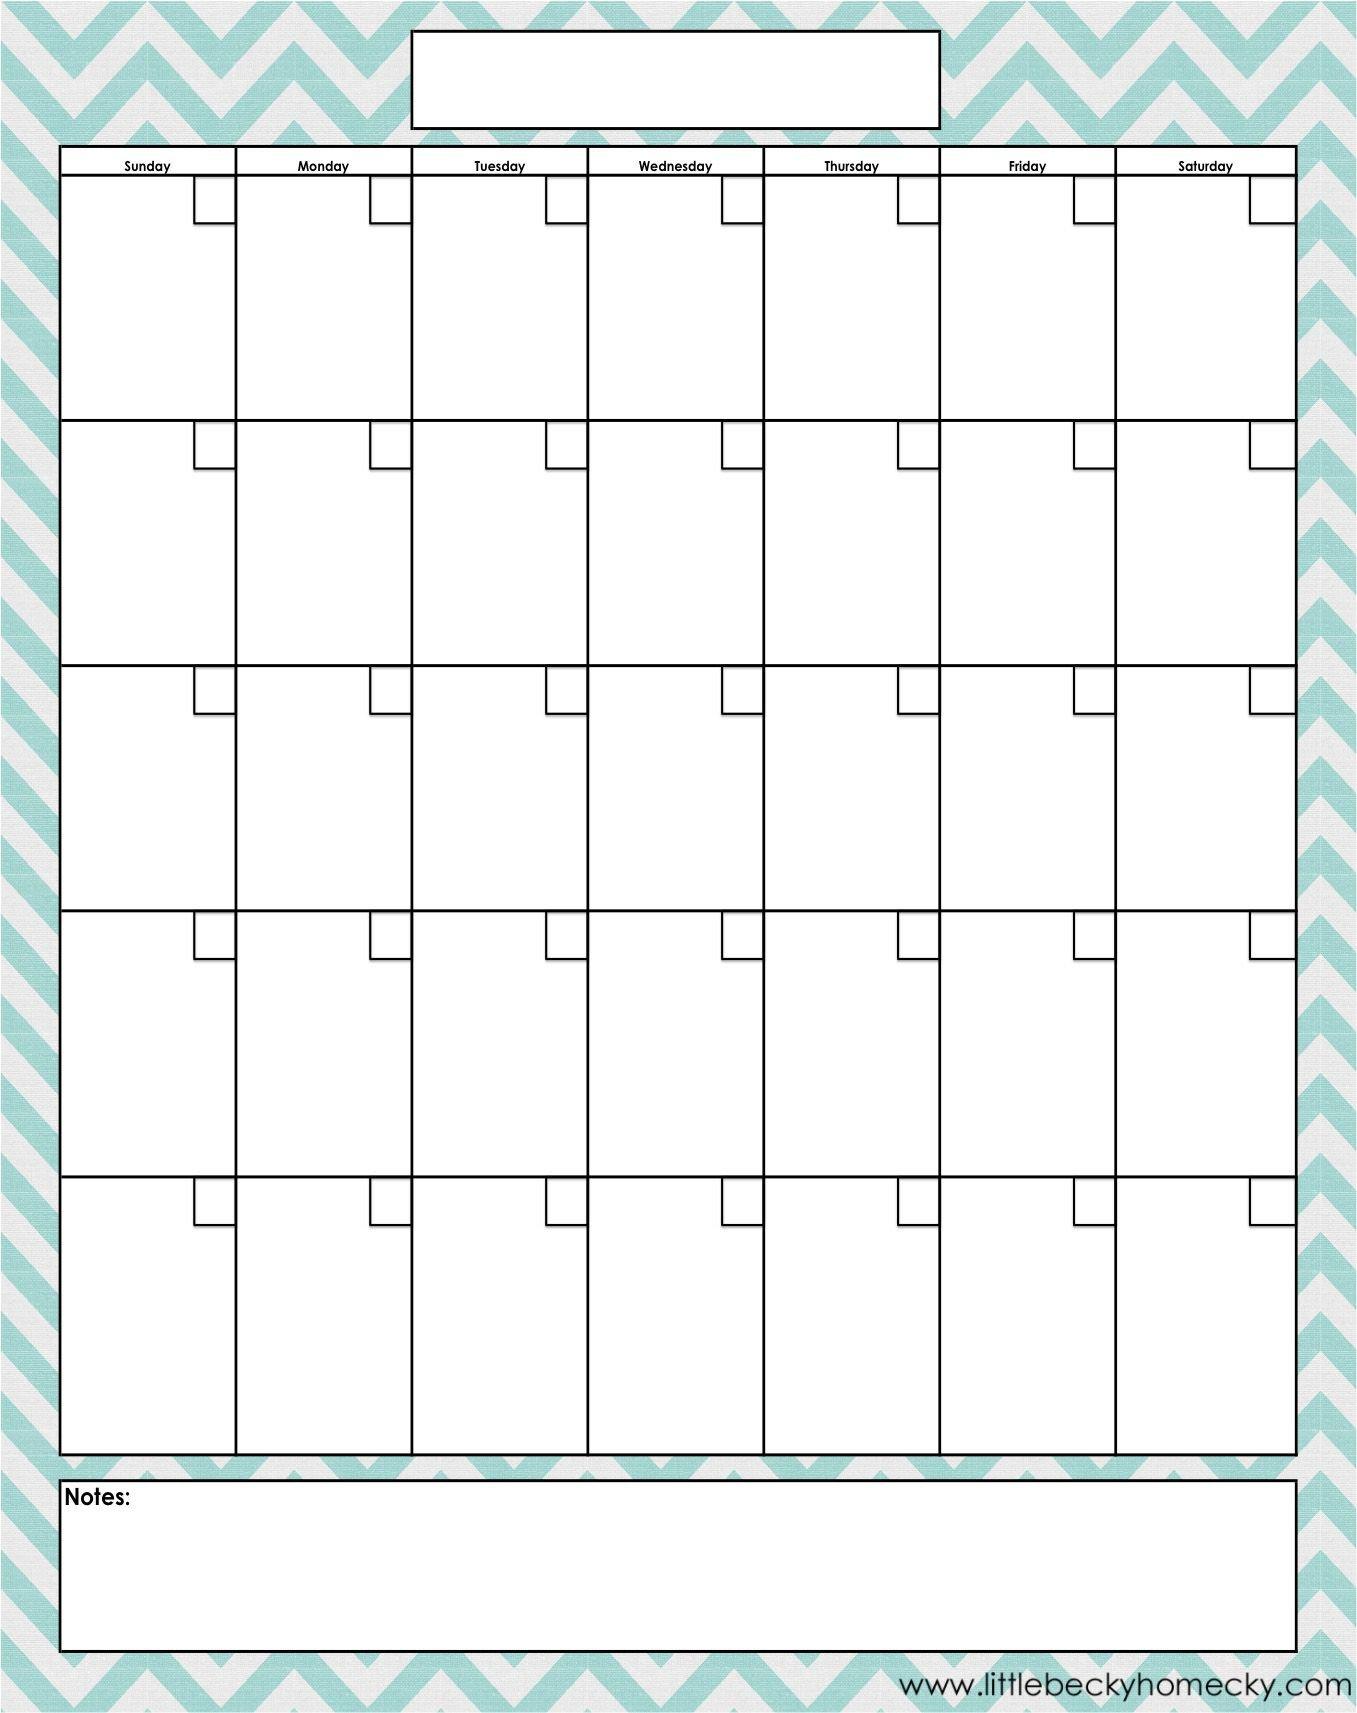 Blank Fill In Calendar | Calendar Template Printable Free Fill In Calendars